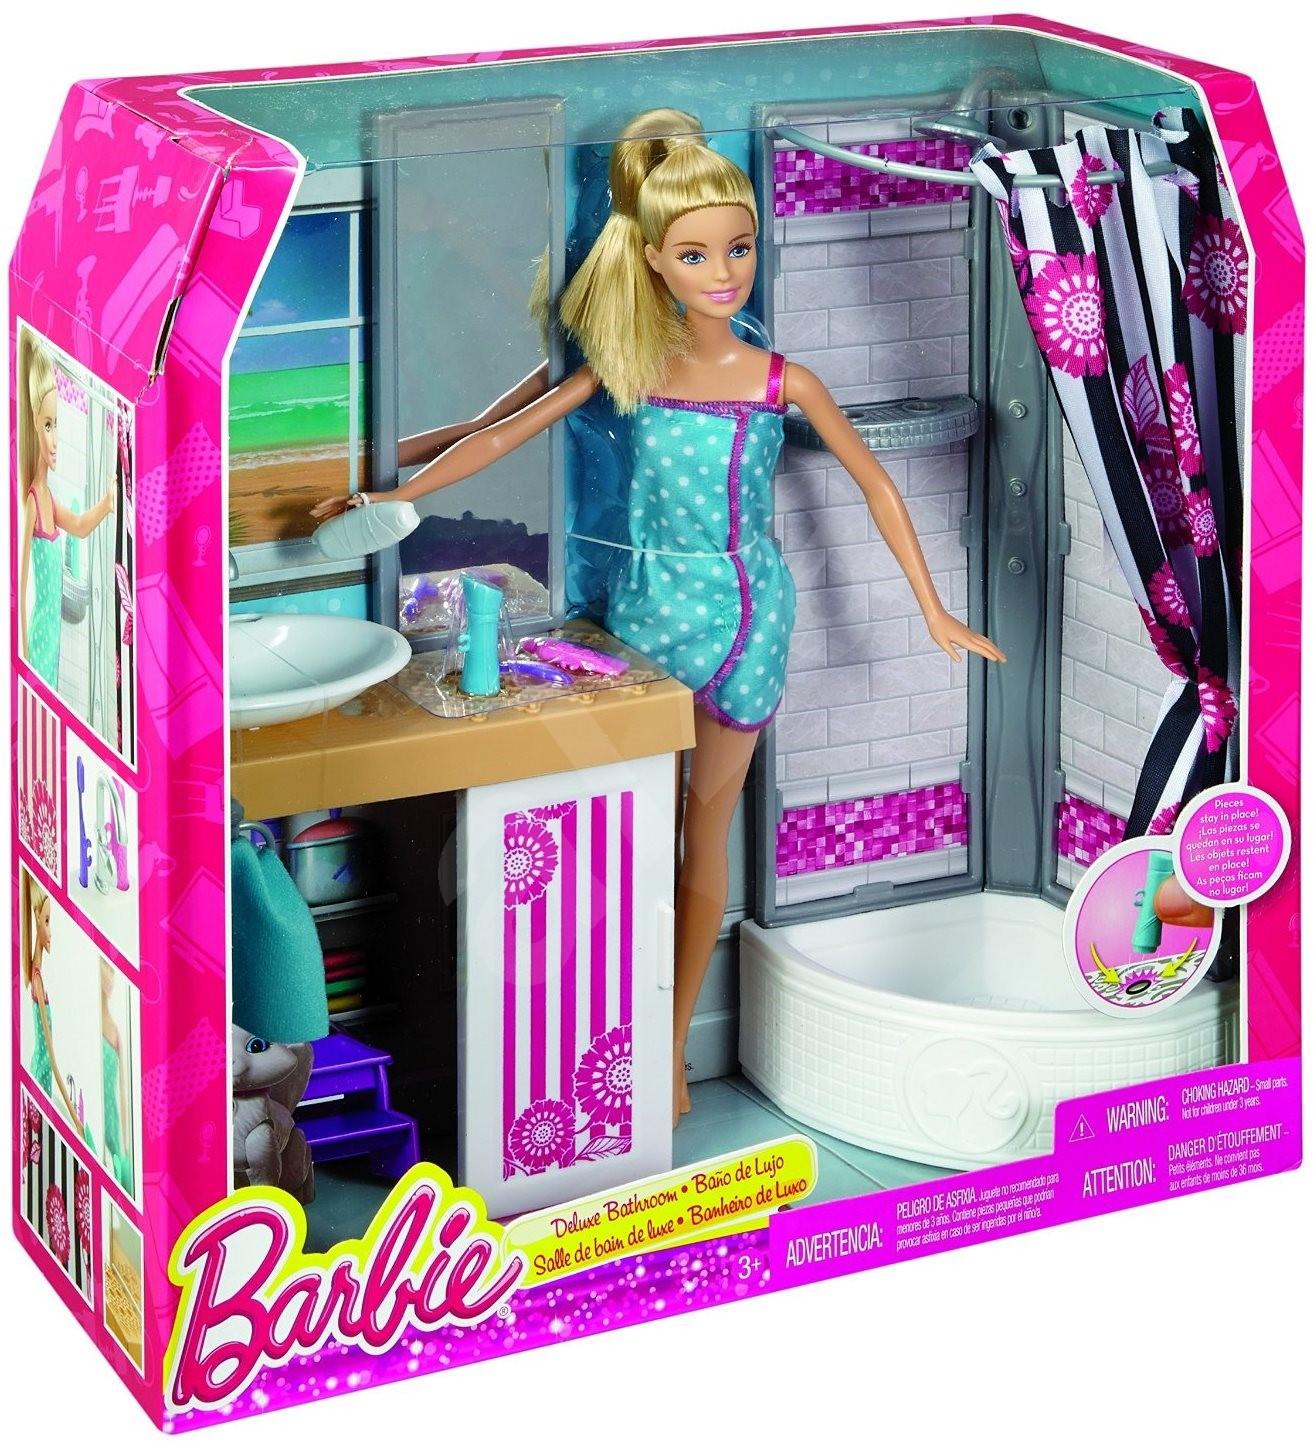 Barbie Room: Barbie - Doll Room And Bathroom - Play Set